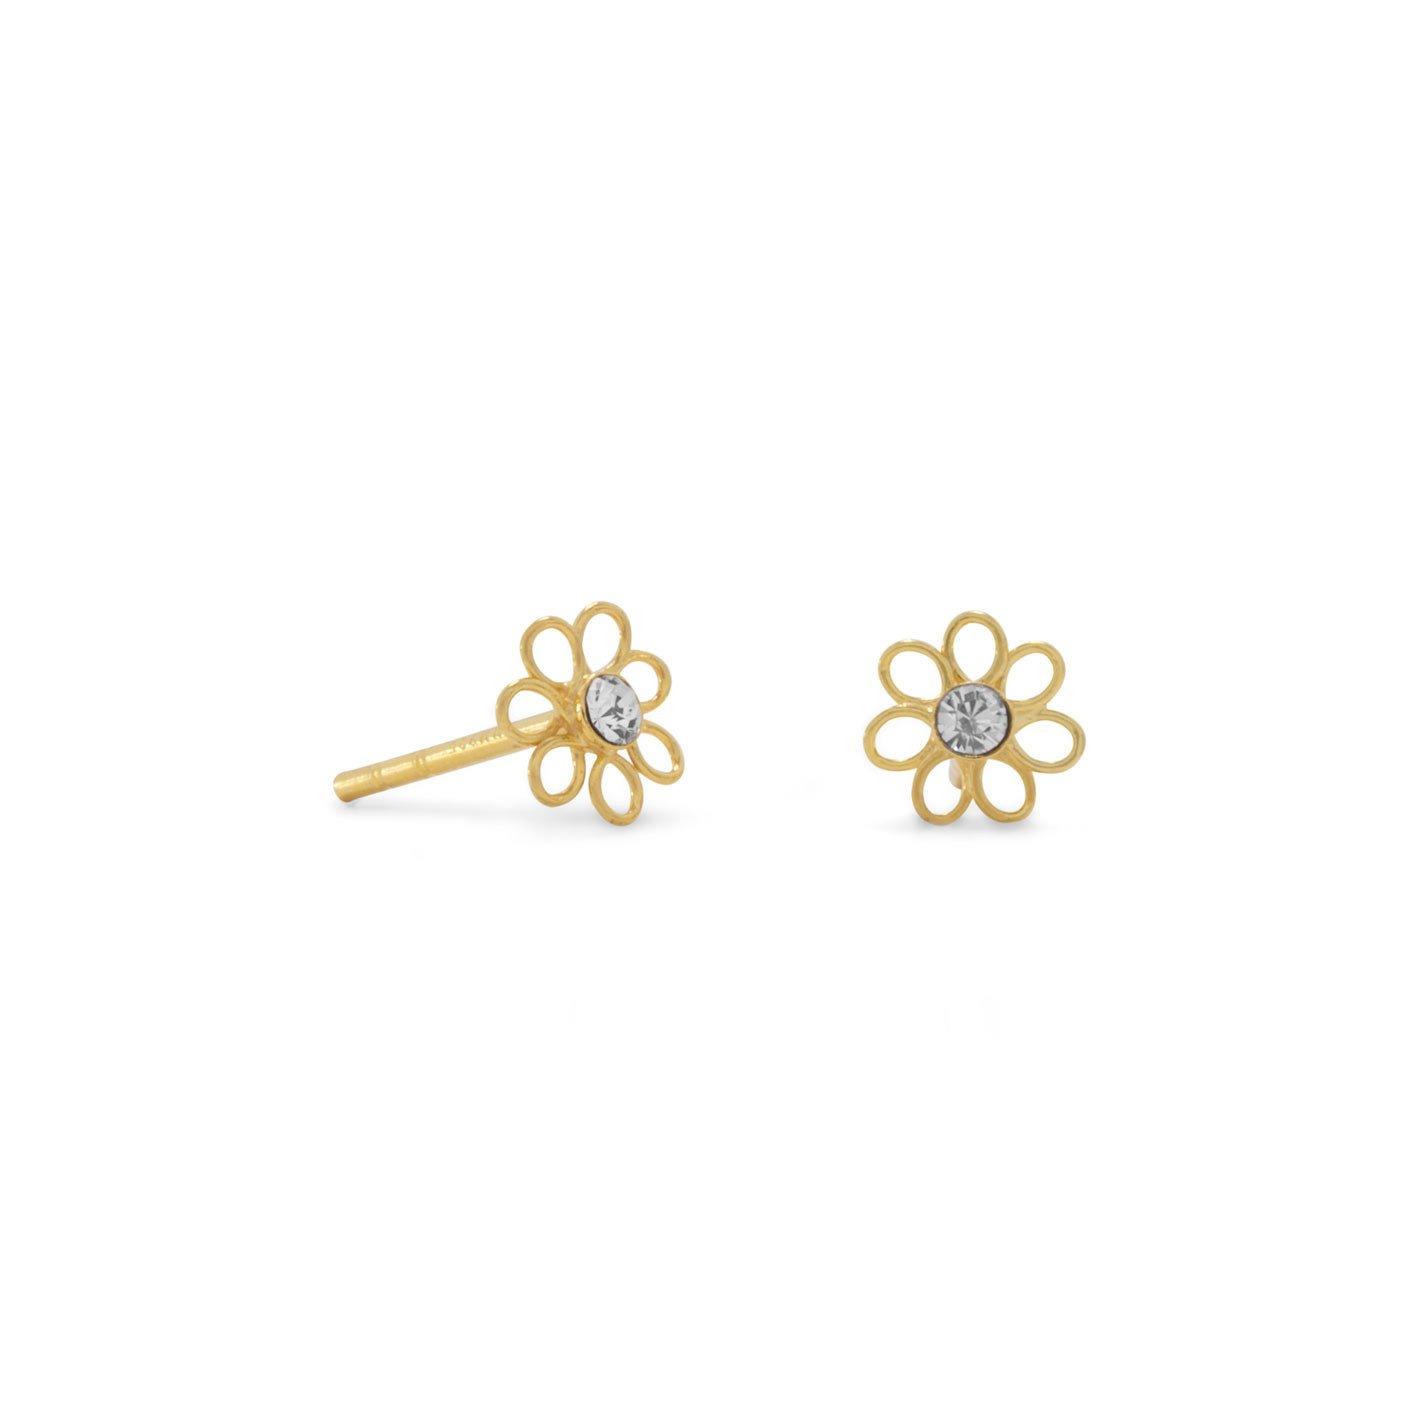 14 Karat Gold Plated Flower Stud Earrings